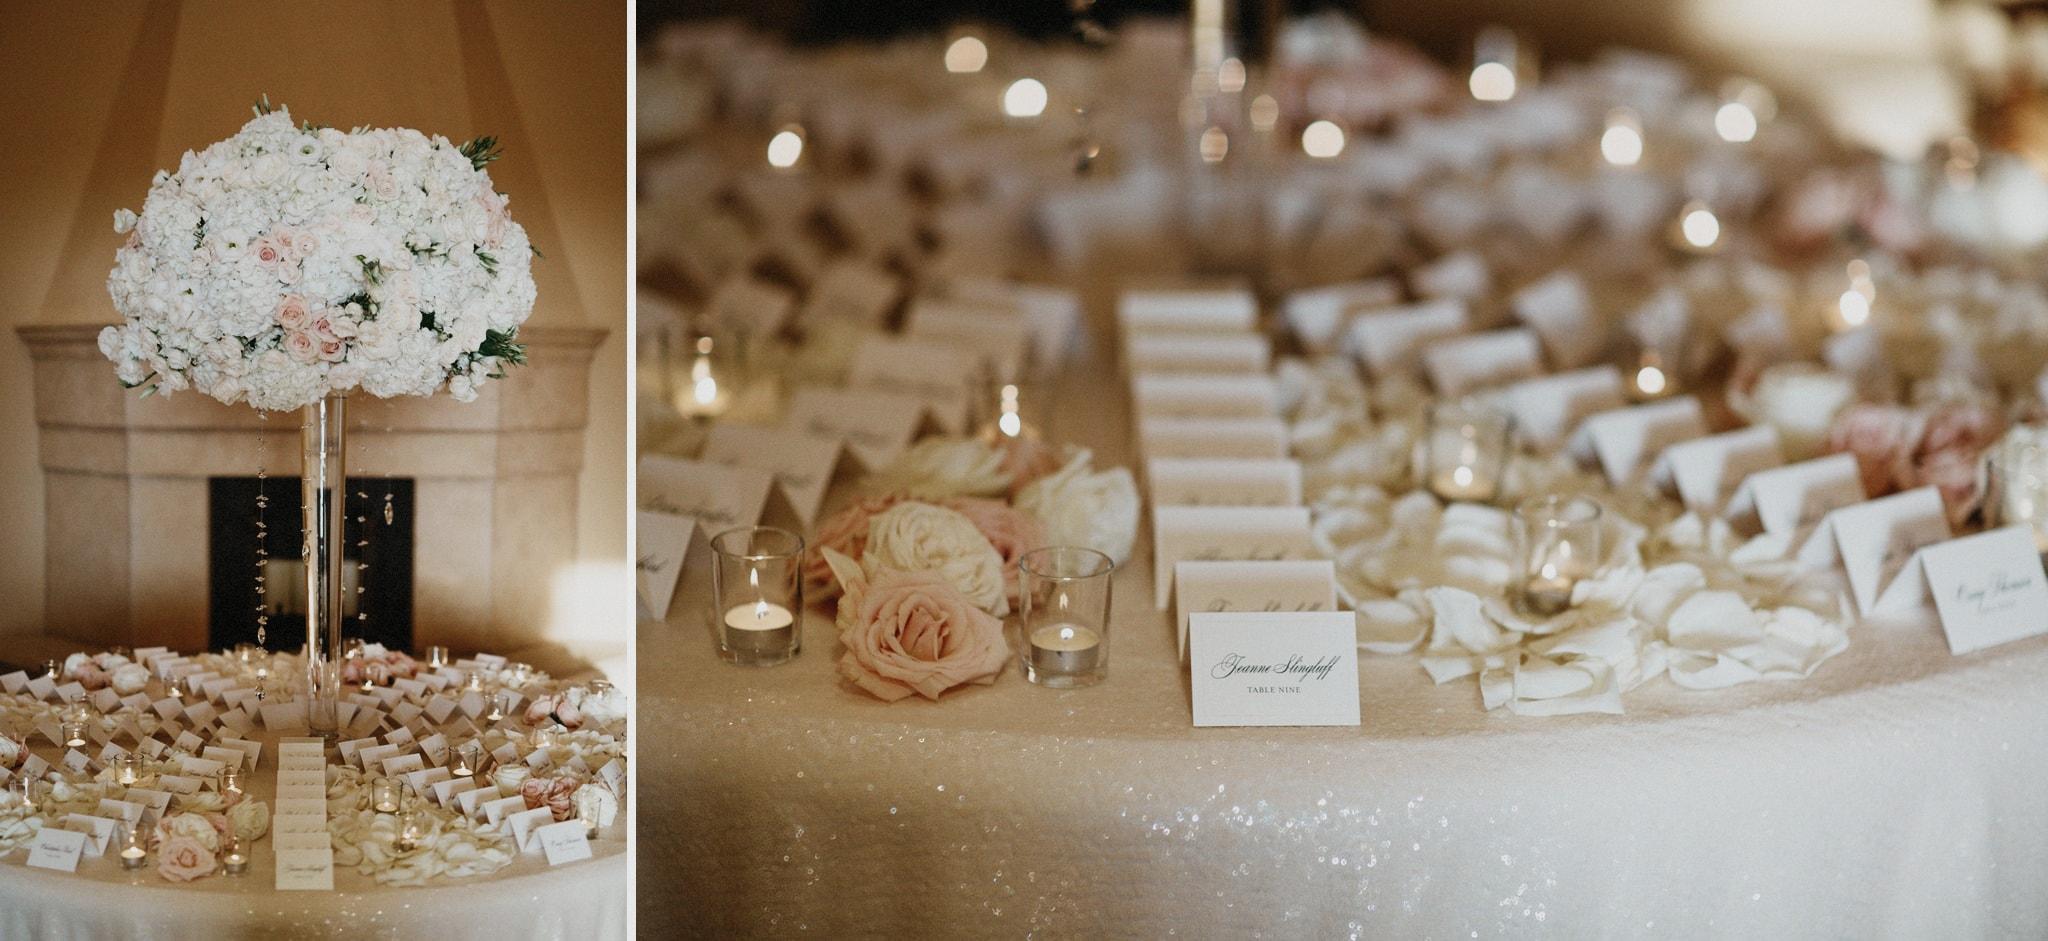 060-wedding-reception-venue-ideas.jpg